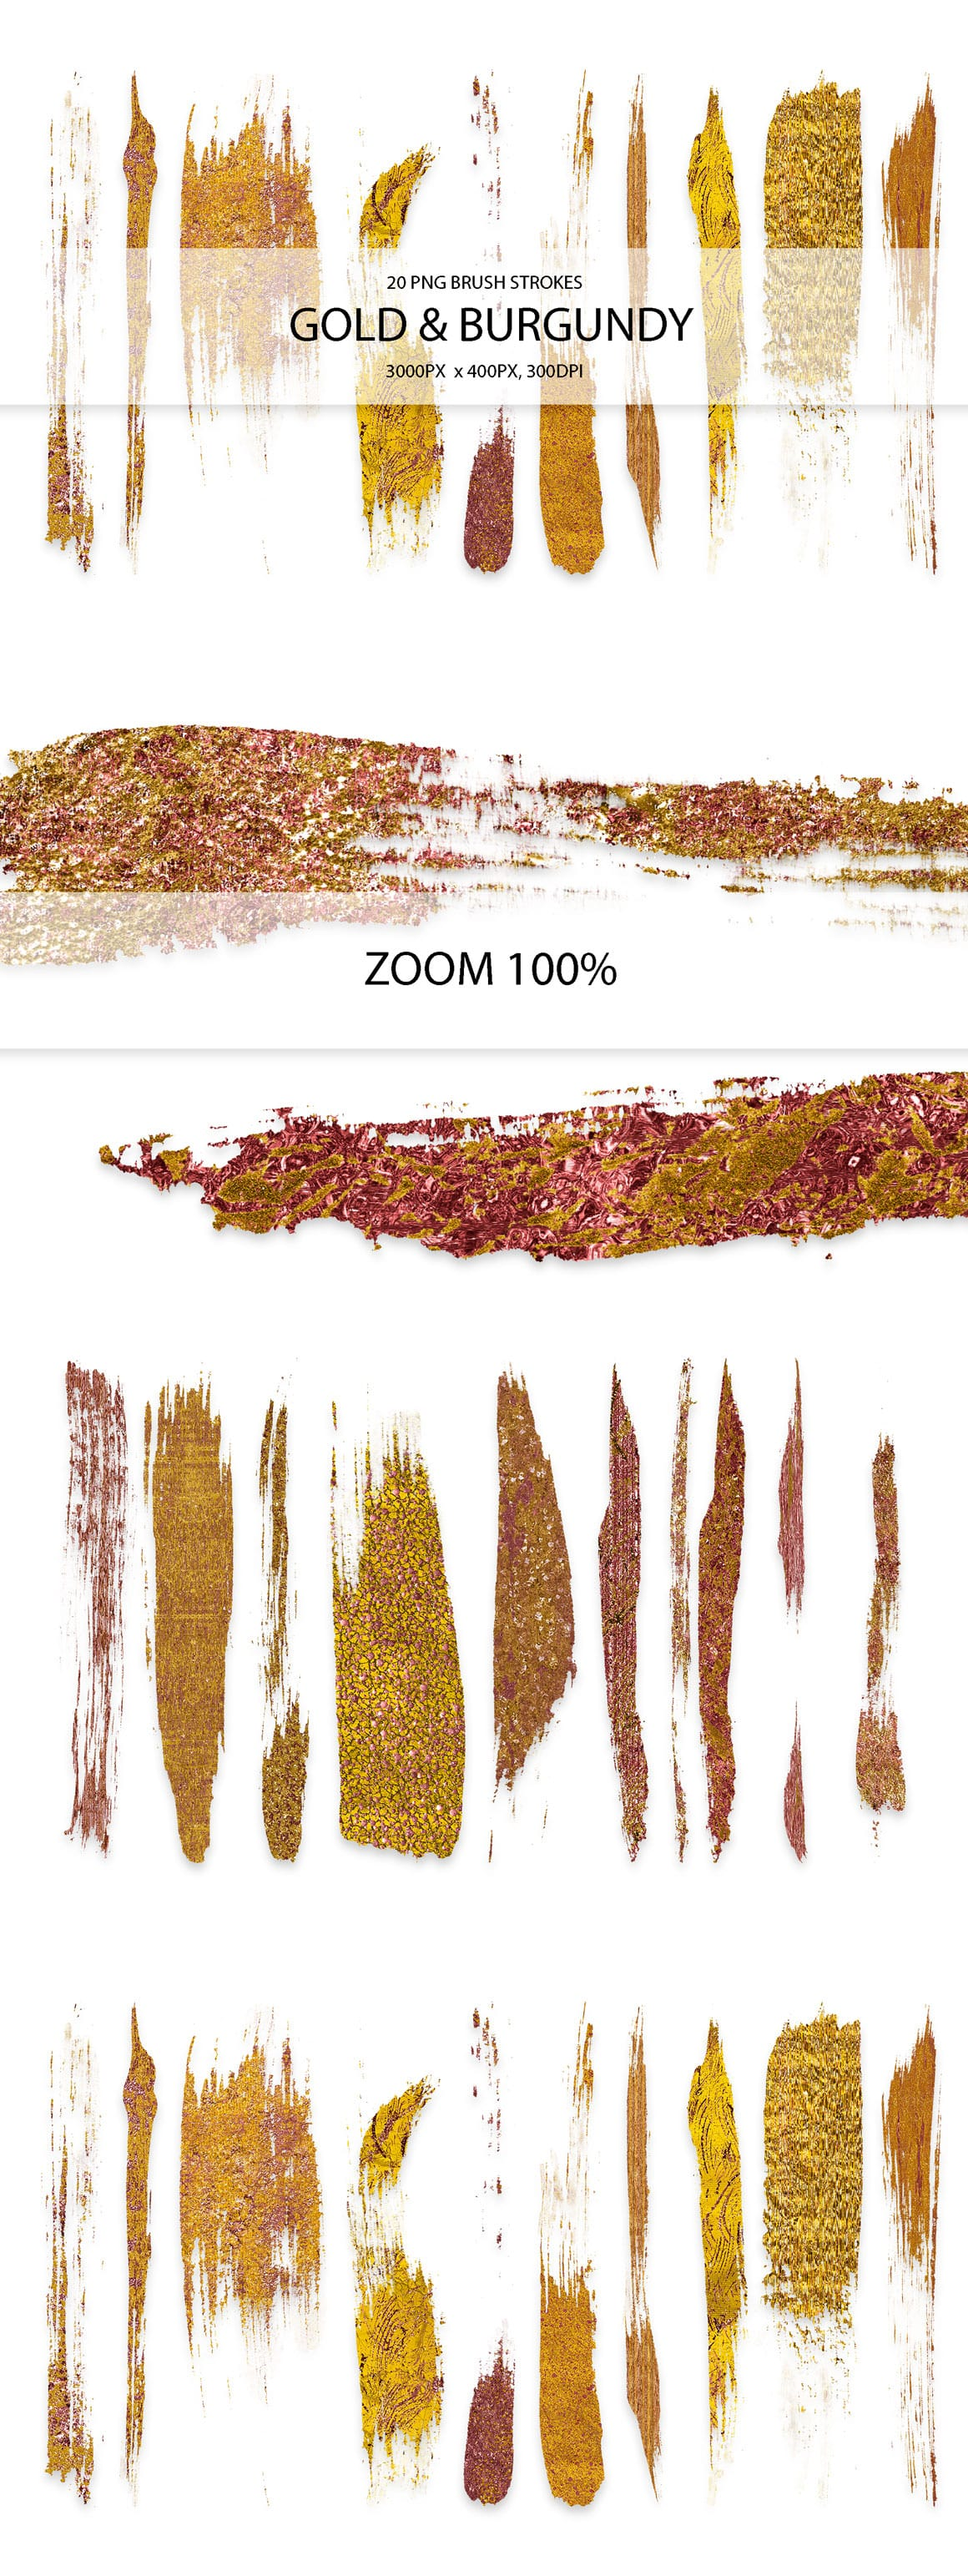 829 Acrylic Brush Strokes and Digital Brush Strokes - $9 - GoldBurgundyStrokes 01 min